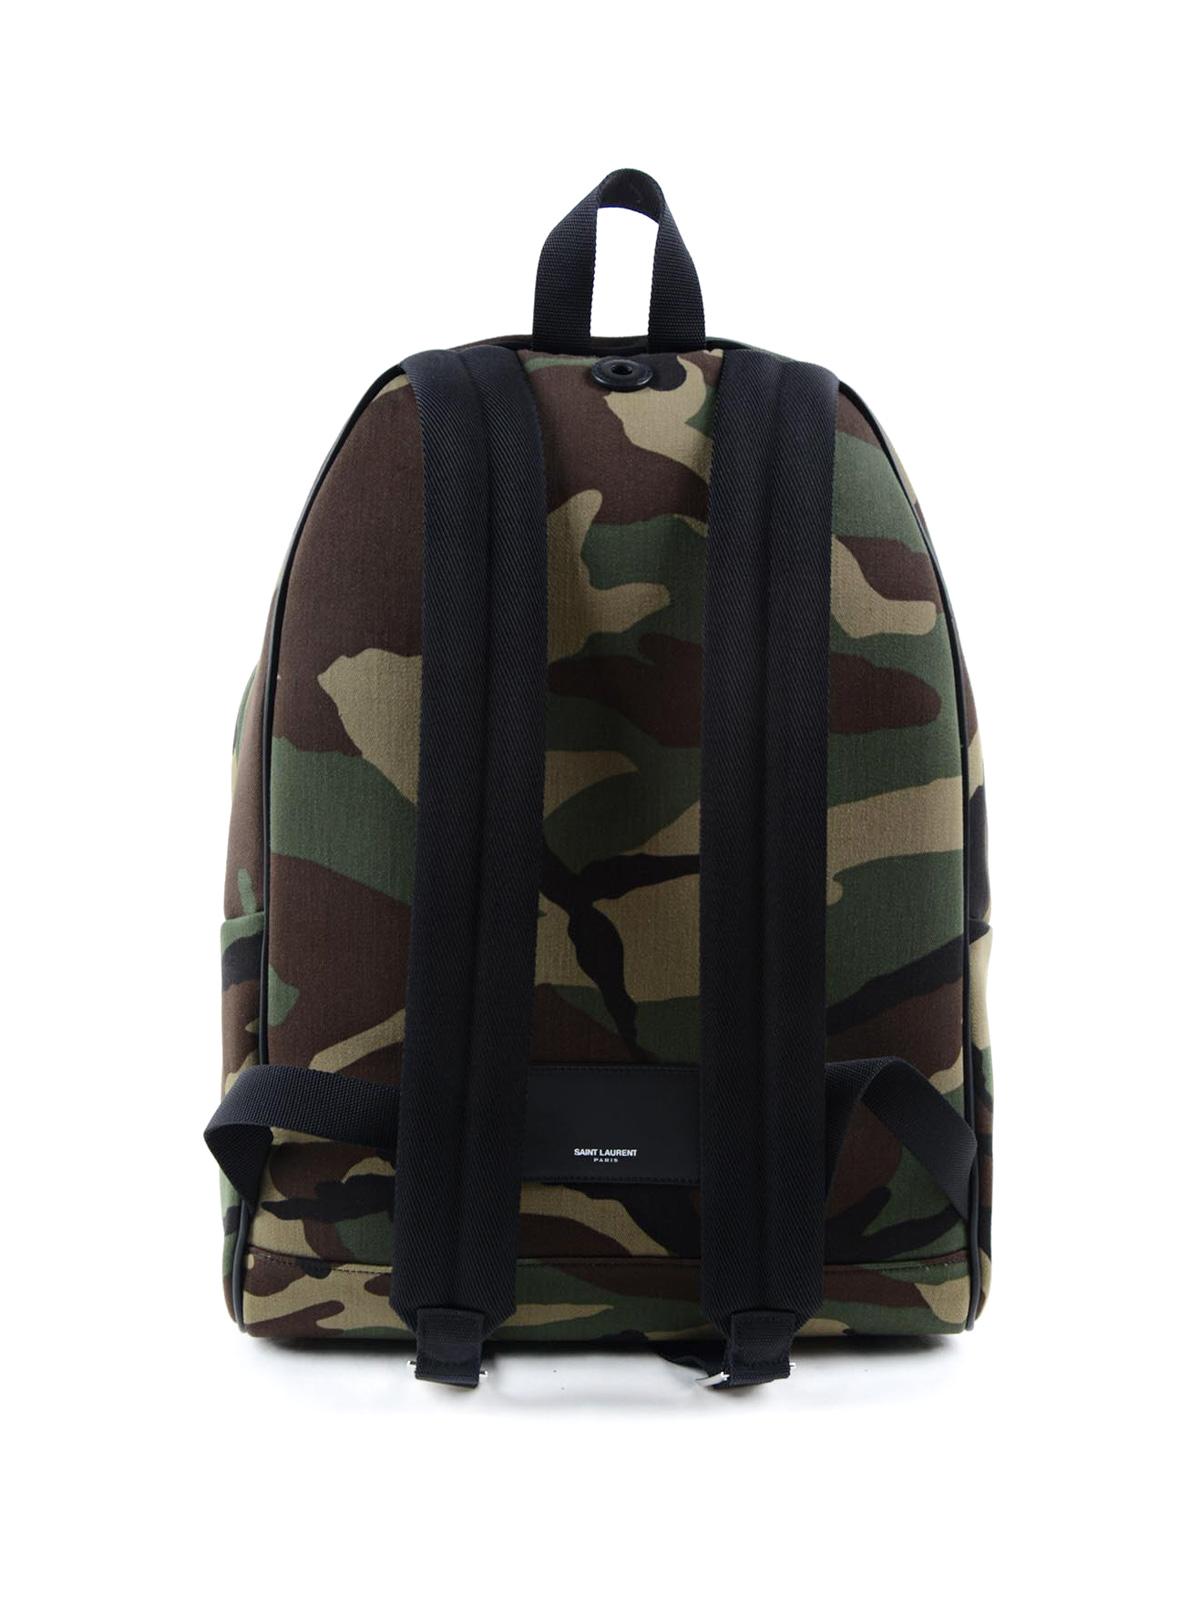 a56fb8c2d3 iKRIX SAINT LAURENT: backpacks - City Sweet Dreams patch backpack